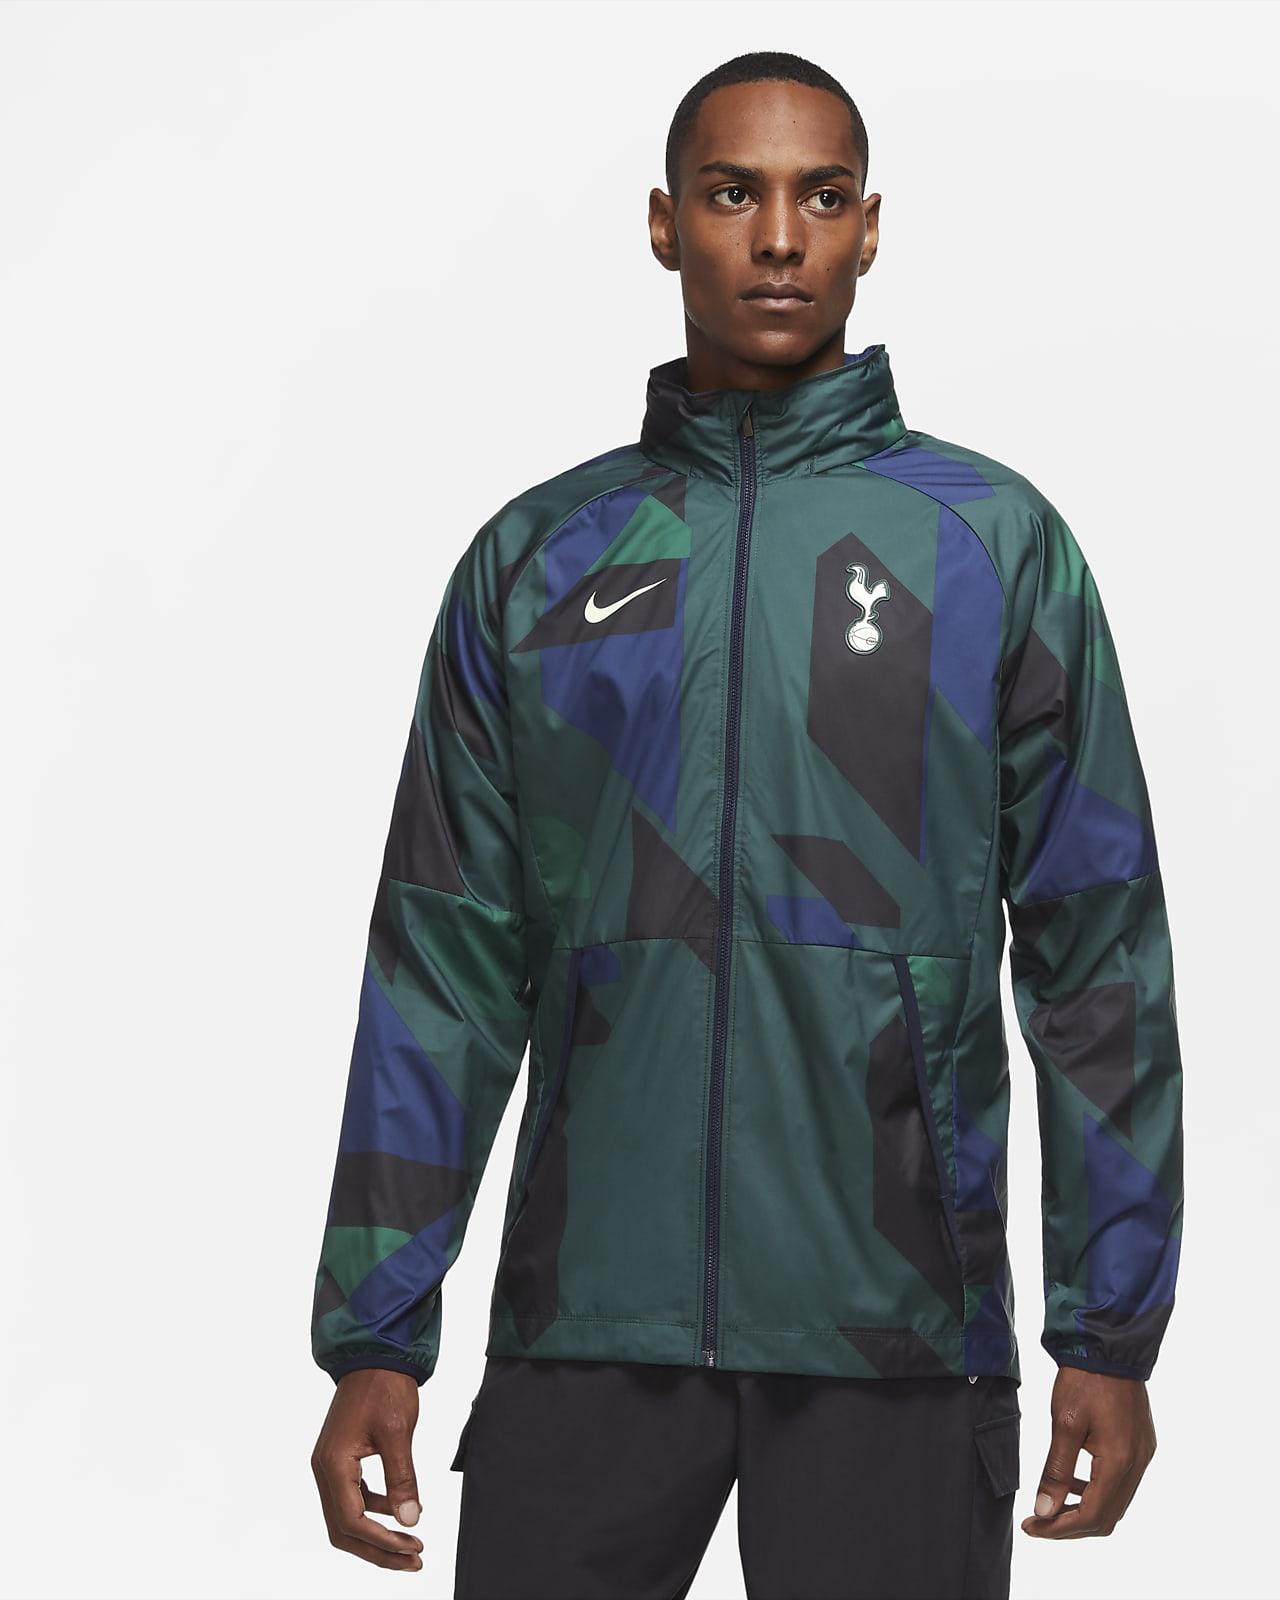 Tottenham Hotspur Men's Graphic Football Jacket